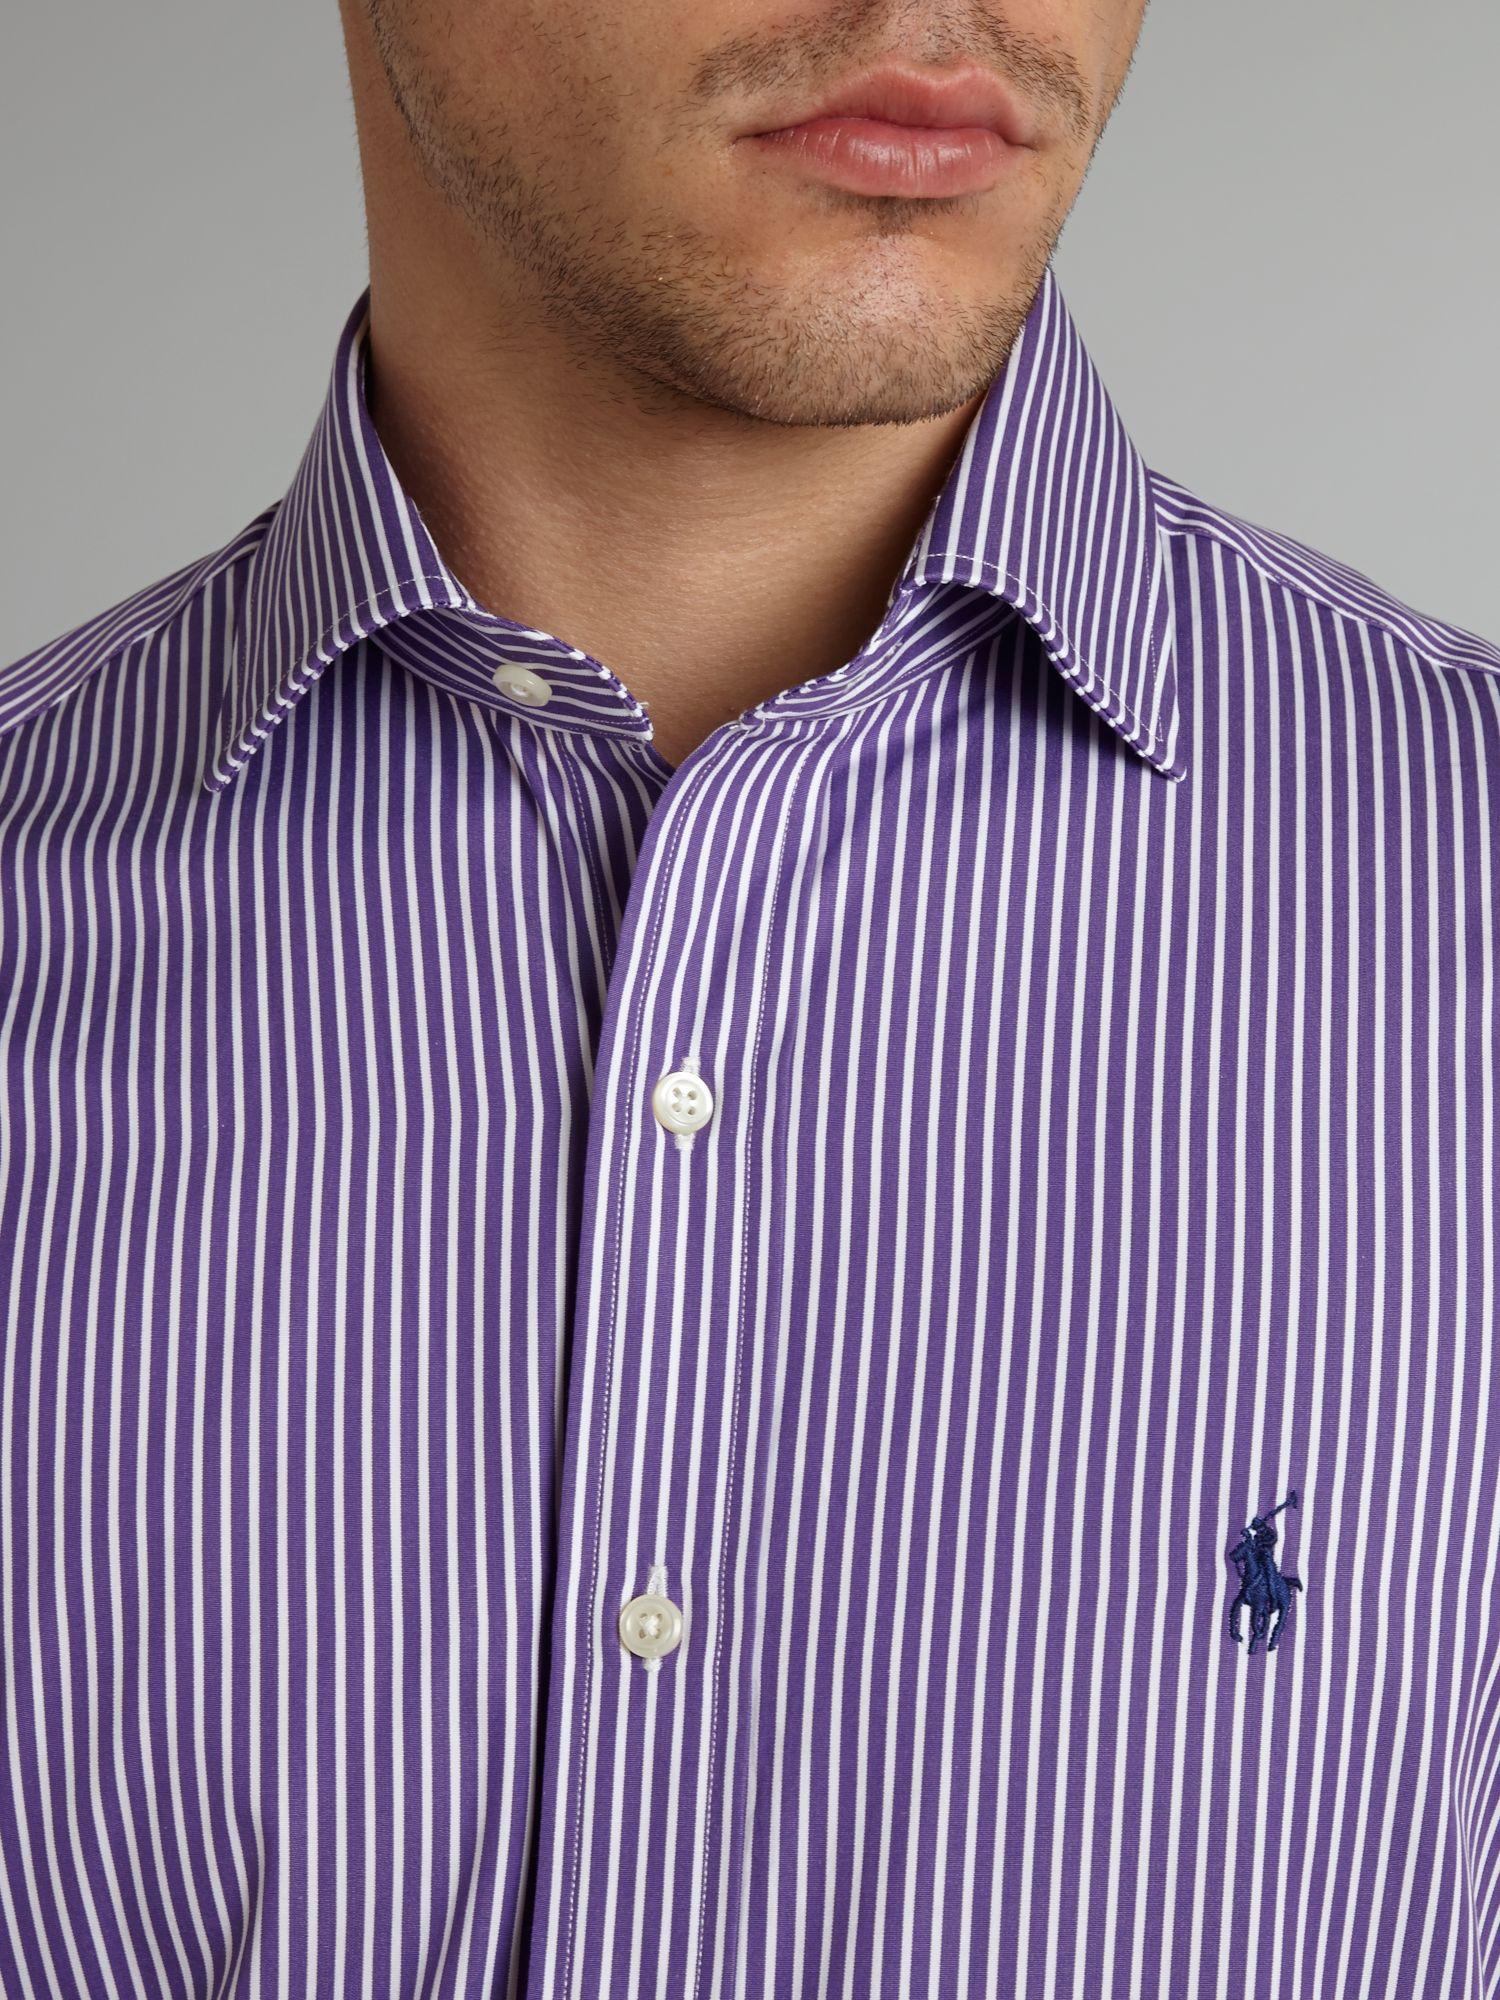 Very Lyst - Polo Ralph Lauren Custom Fit Regent Fine Stripe Shirt in  OB78